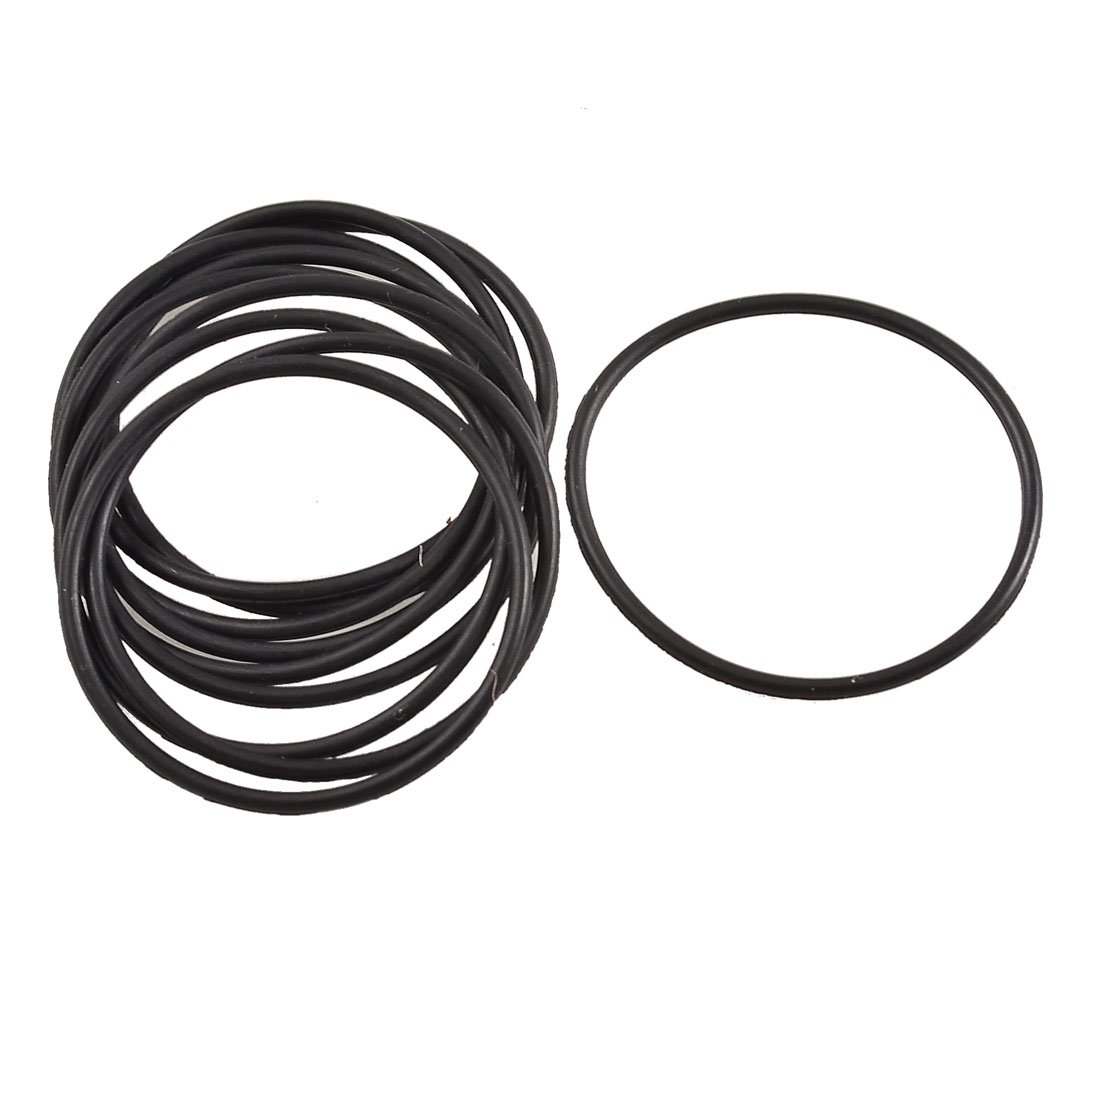 Torque Range 20 to 150-Inch CDI 1501MRPH 1//4-Inch Drive Adjustable Micrometer Torque Wrench